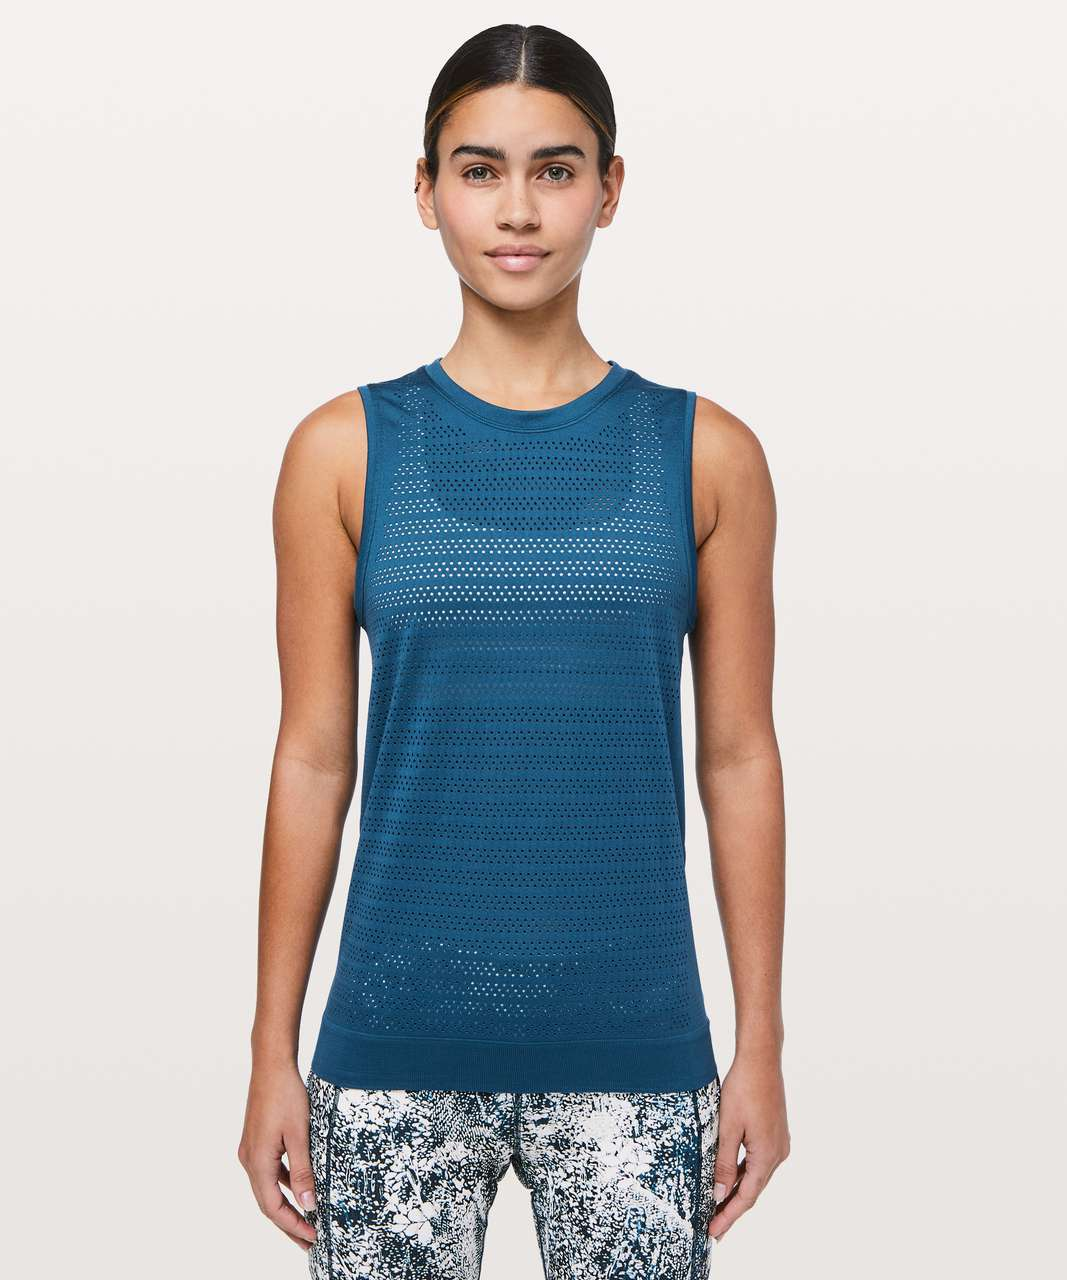 Lululemon Breeze By Muscle Tank II - Carbon Blue / Carbon Blue